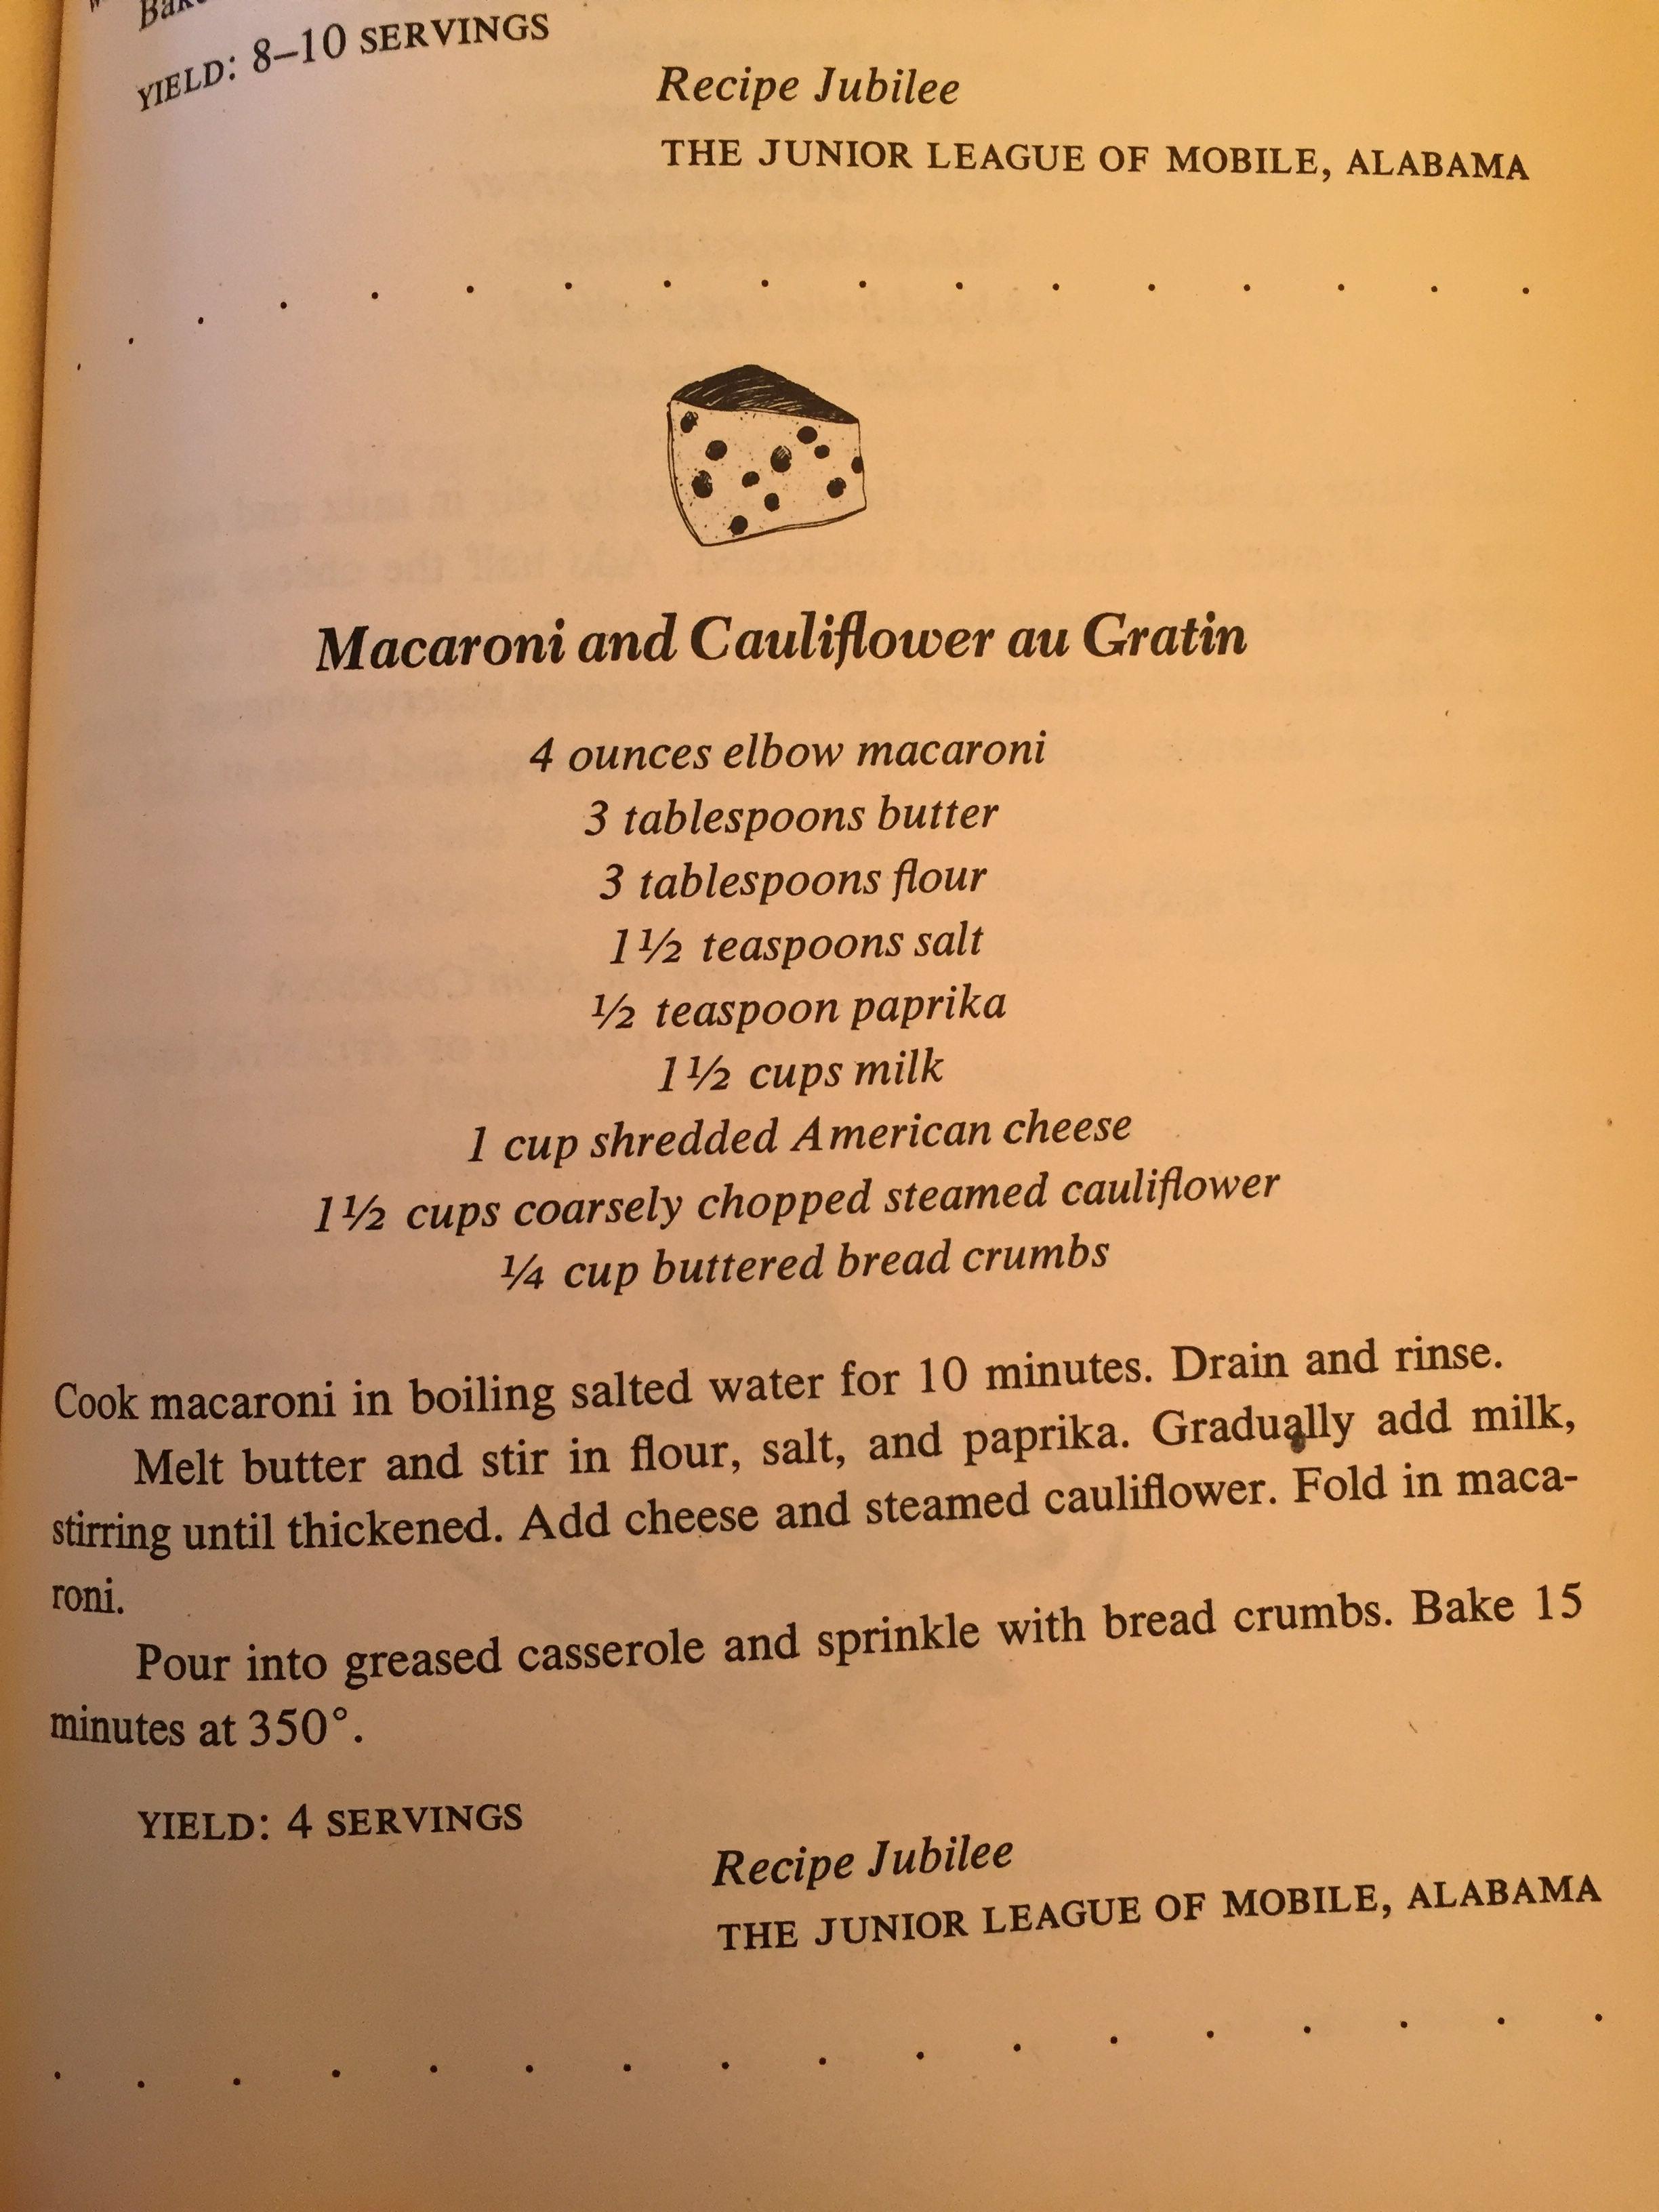 Macaroni and cauliflower au gratin